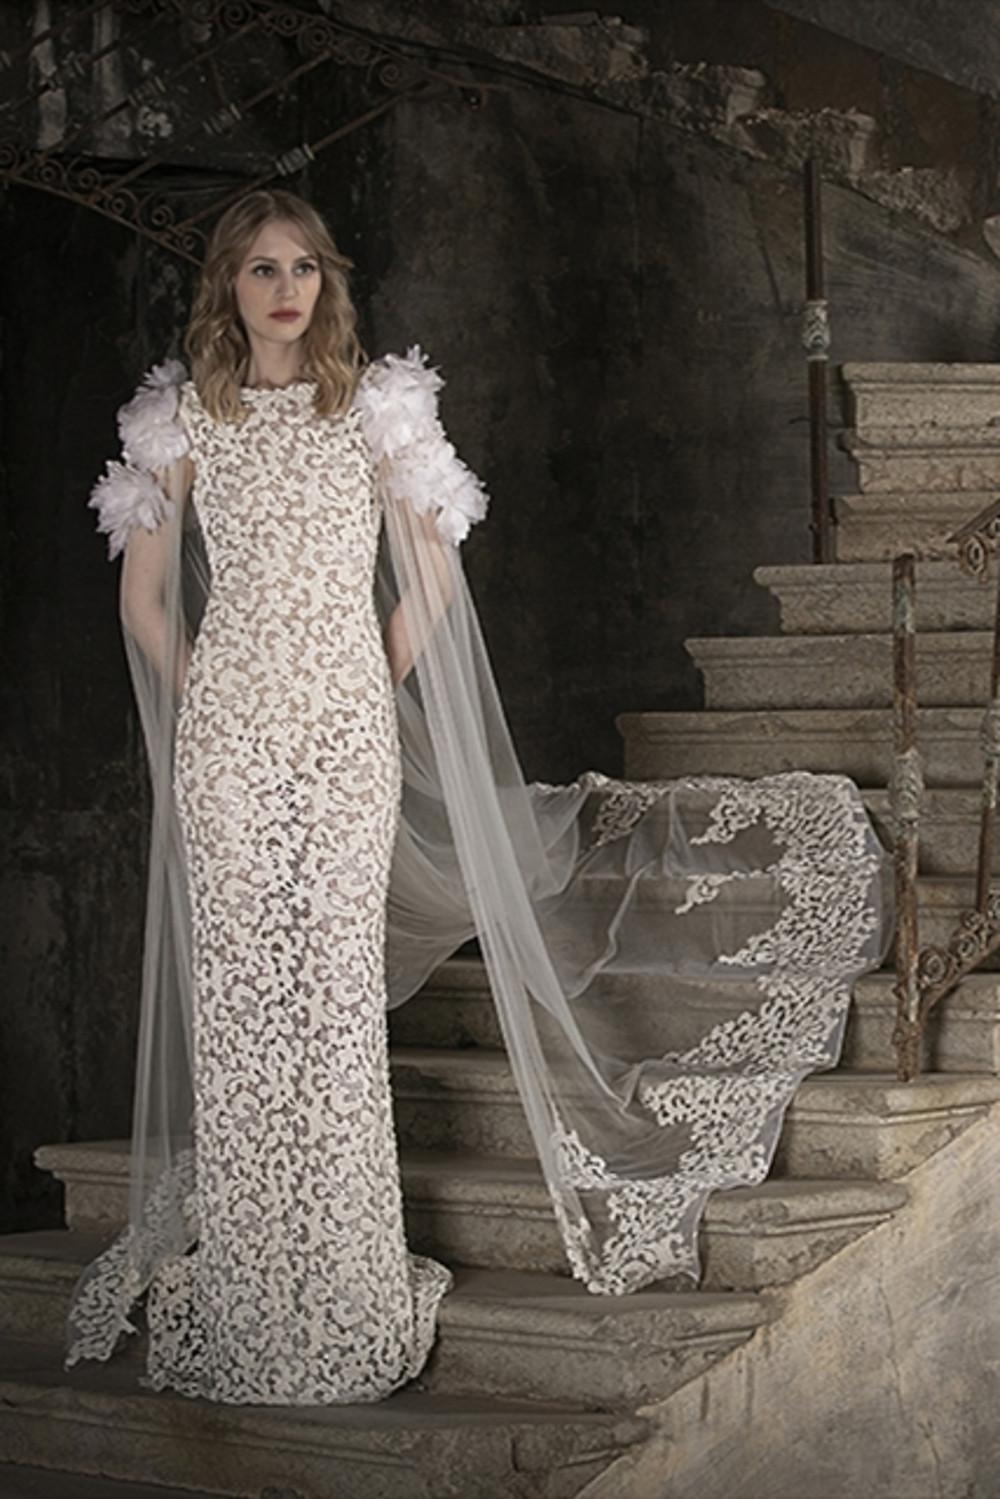 A sleek cut macramé wedding dress, featuring a tulle cape and statement ruffles on the shoulder